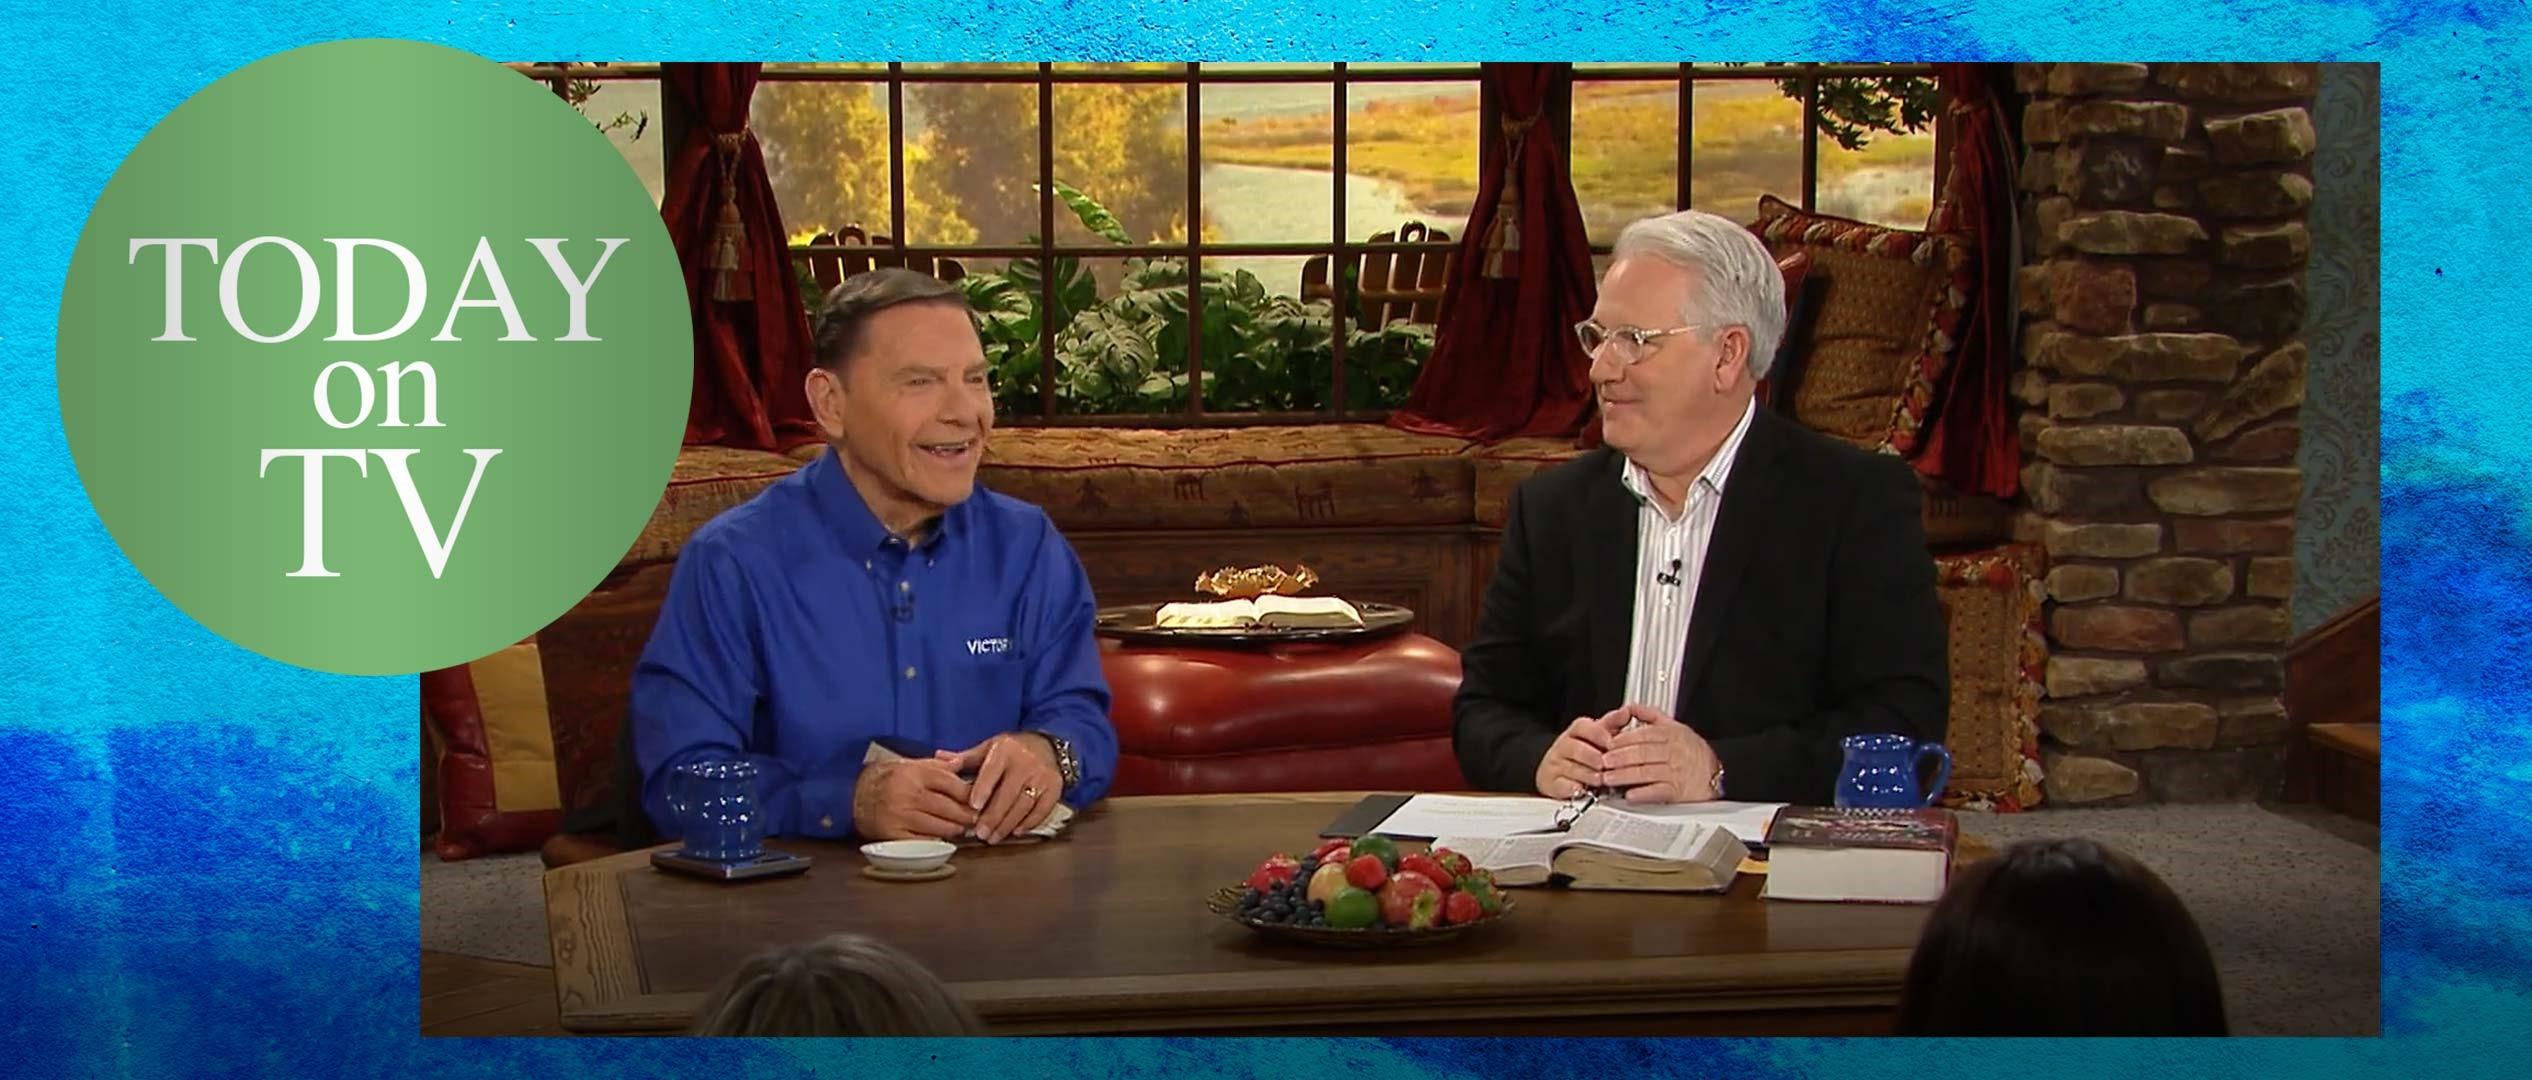 BVOV TV link 26-Jul-2021 - The Goodness of God